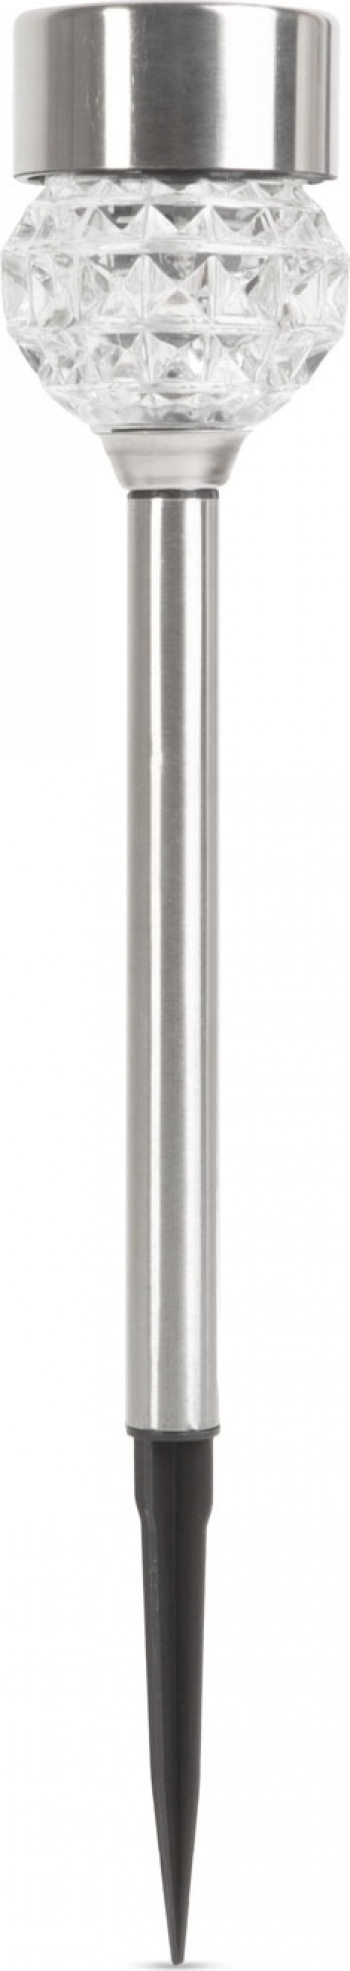 Lampa Solara LED din Metal Satinat si Sticla tip Diamant Inaltime 37cm Corpuri de iluminat